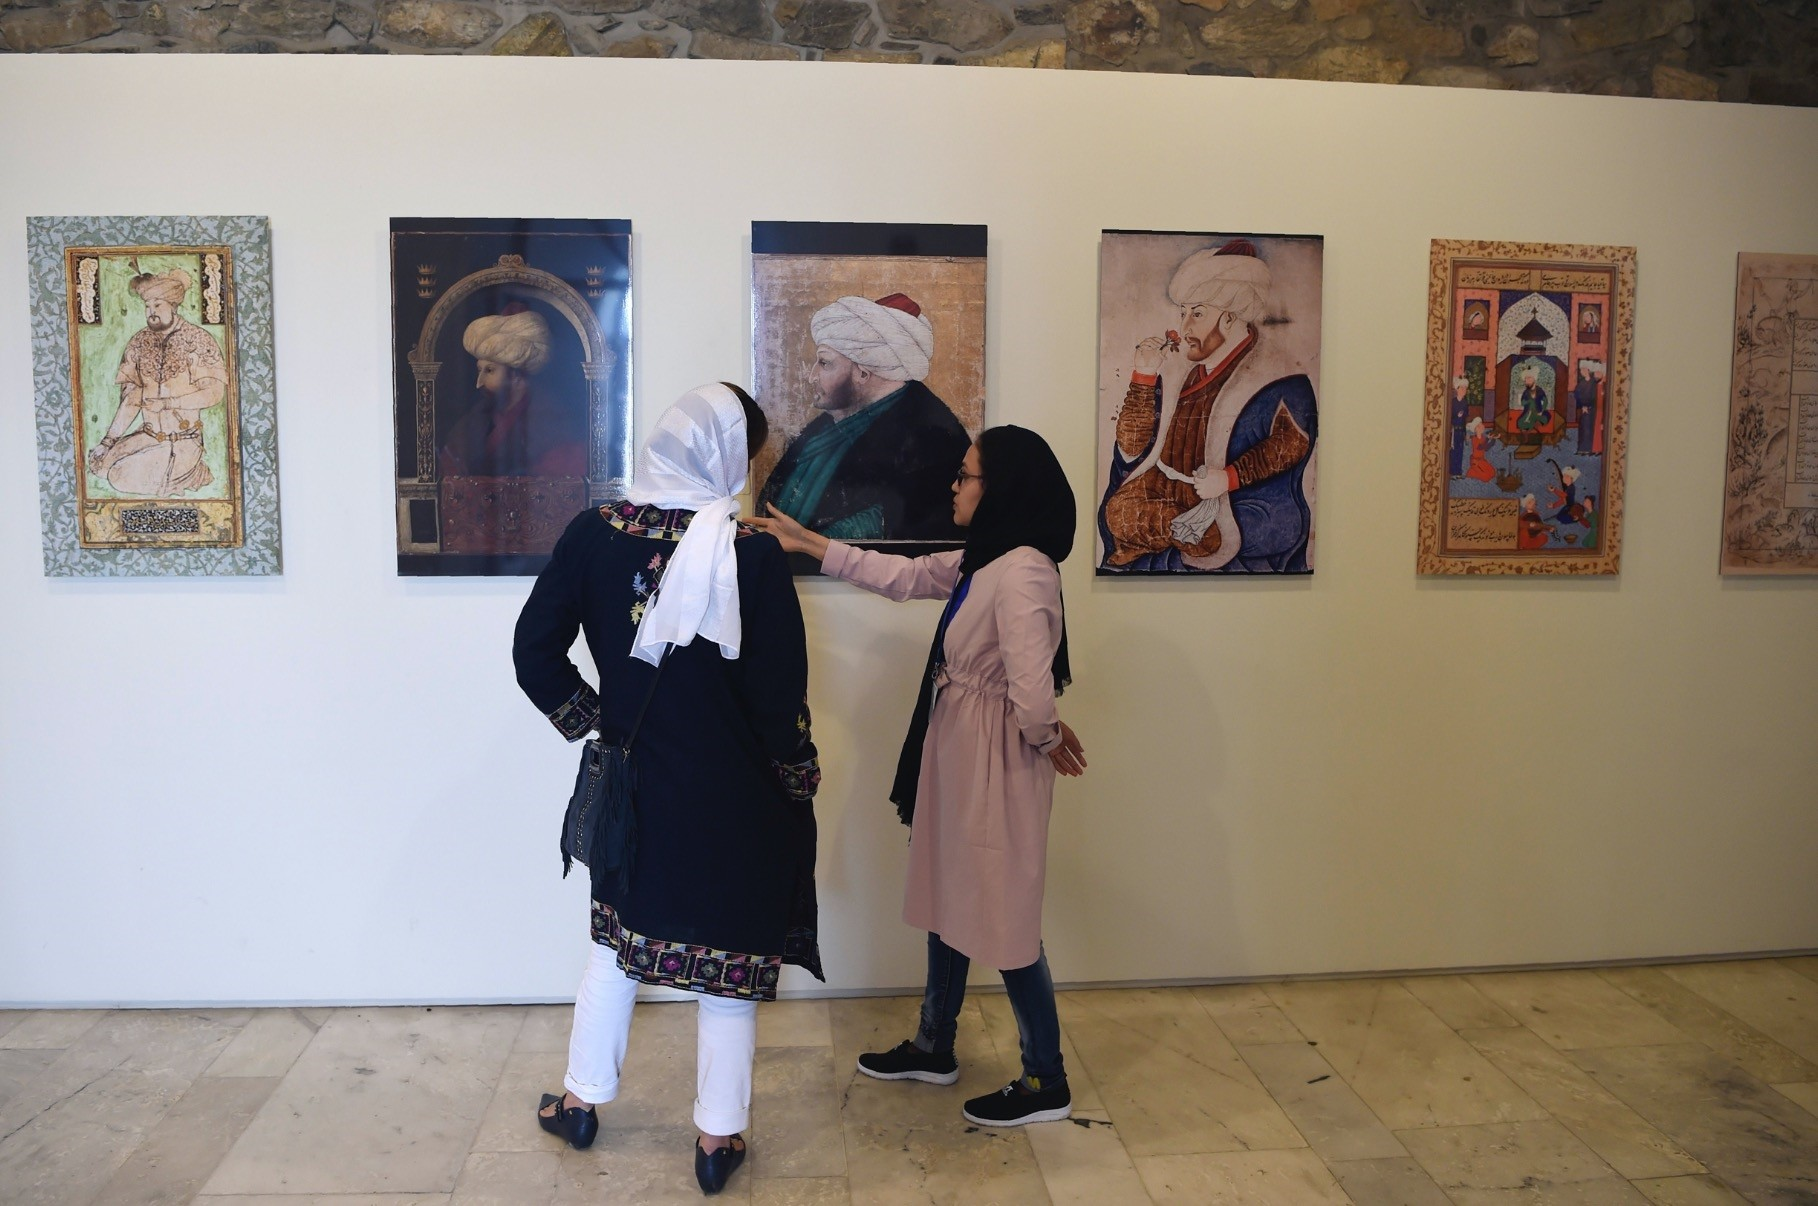 Afghan visitors walk past the display of Mughal paintings at the u201cKing Baburu2019s Kabul, Cradle of the Mughal Empireu201d exhibition in Kabul.